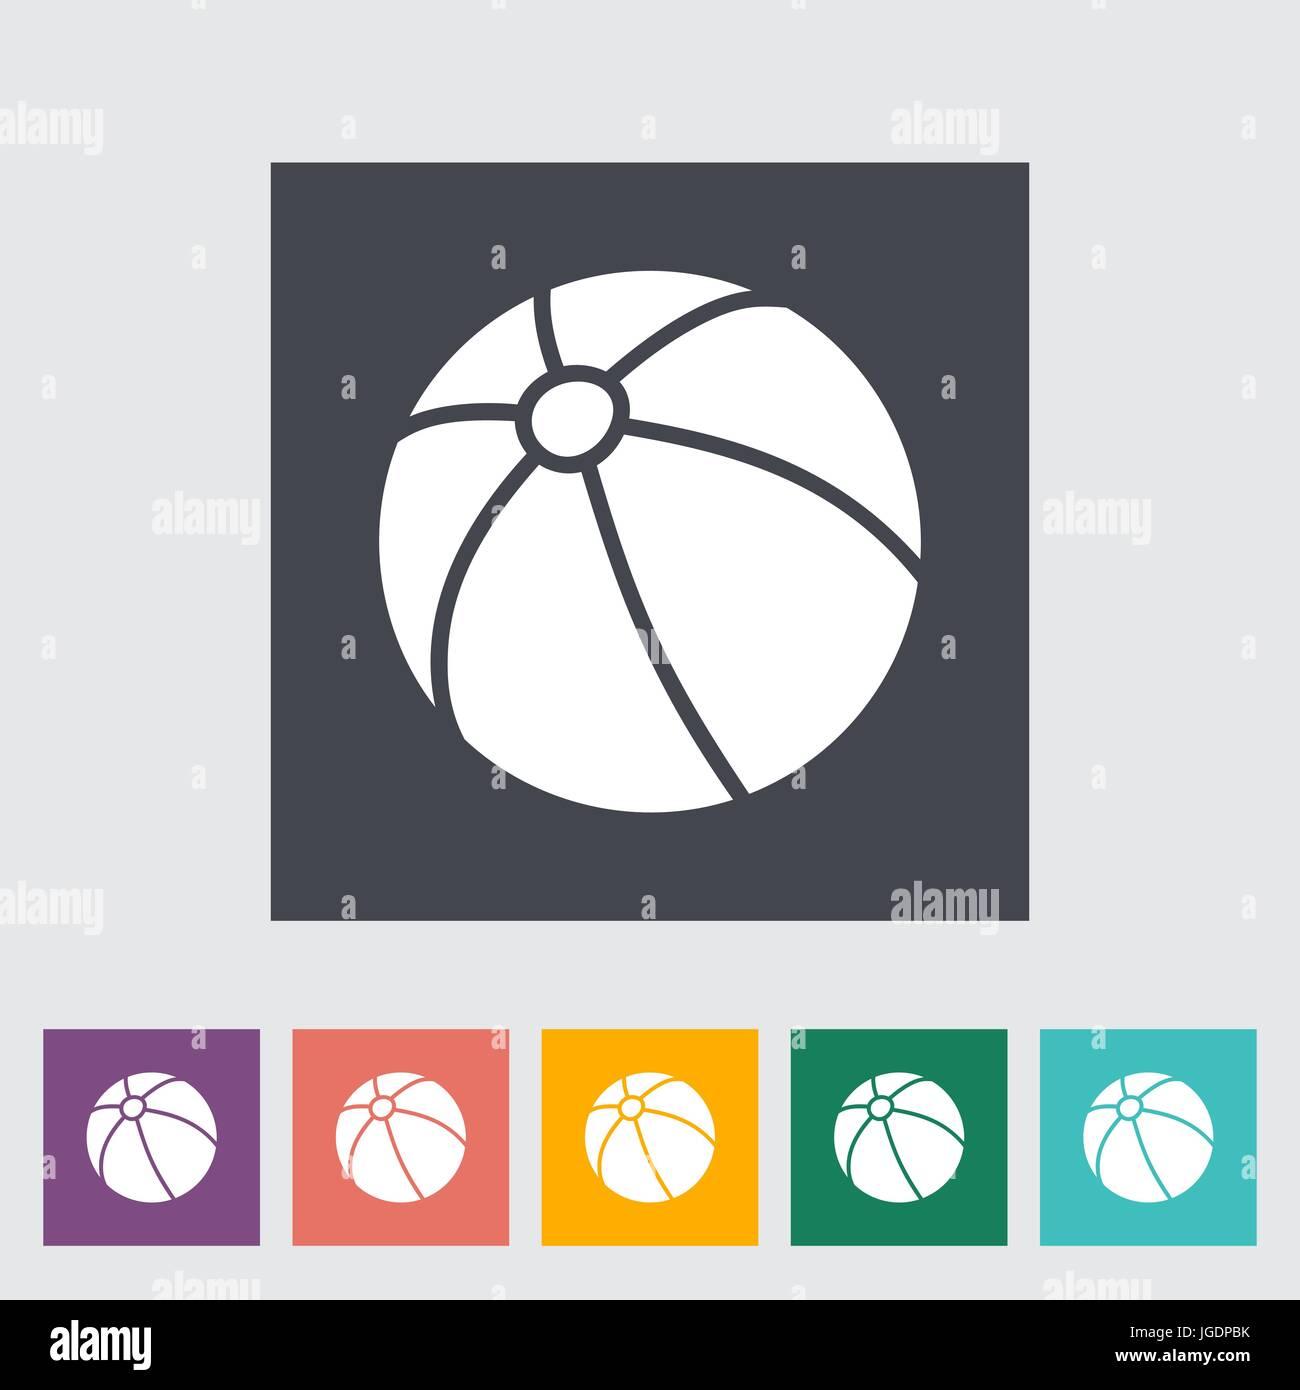 Plastic Ball With Logo Stockfotos & Plastic Ball With Logo Bilder ...